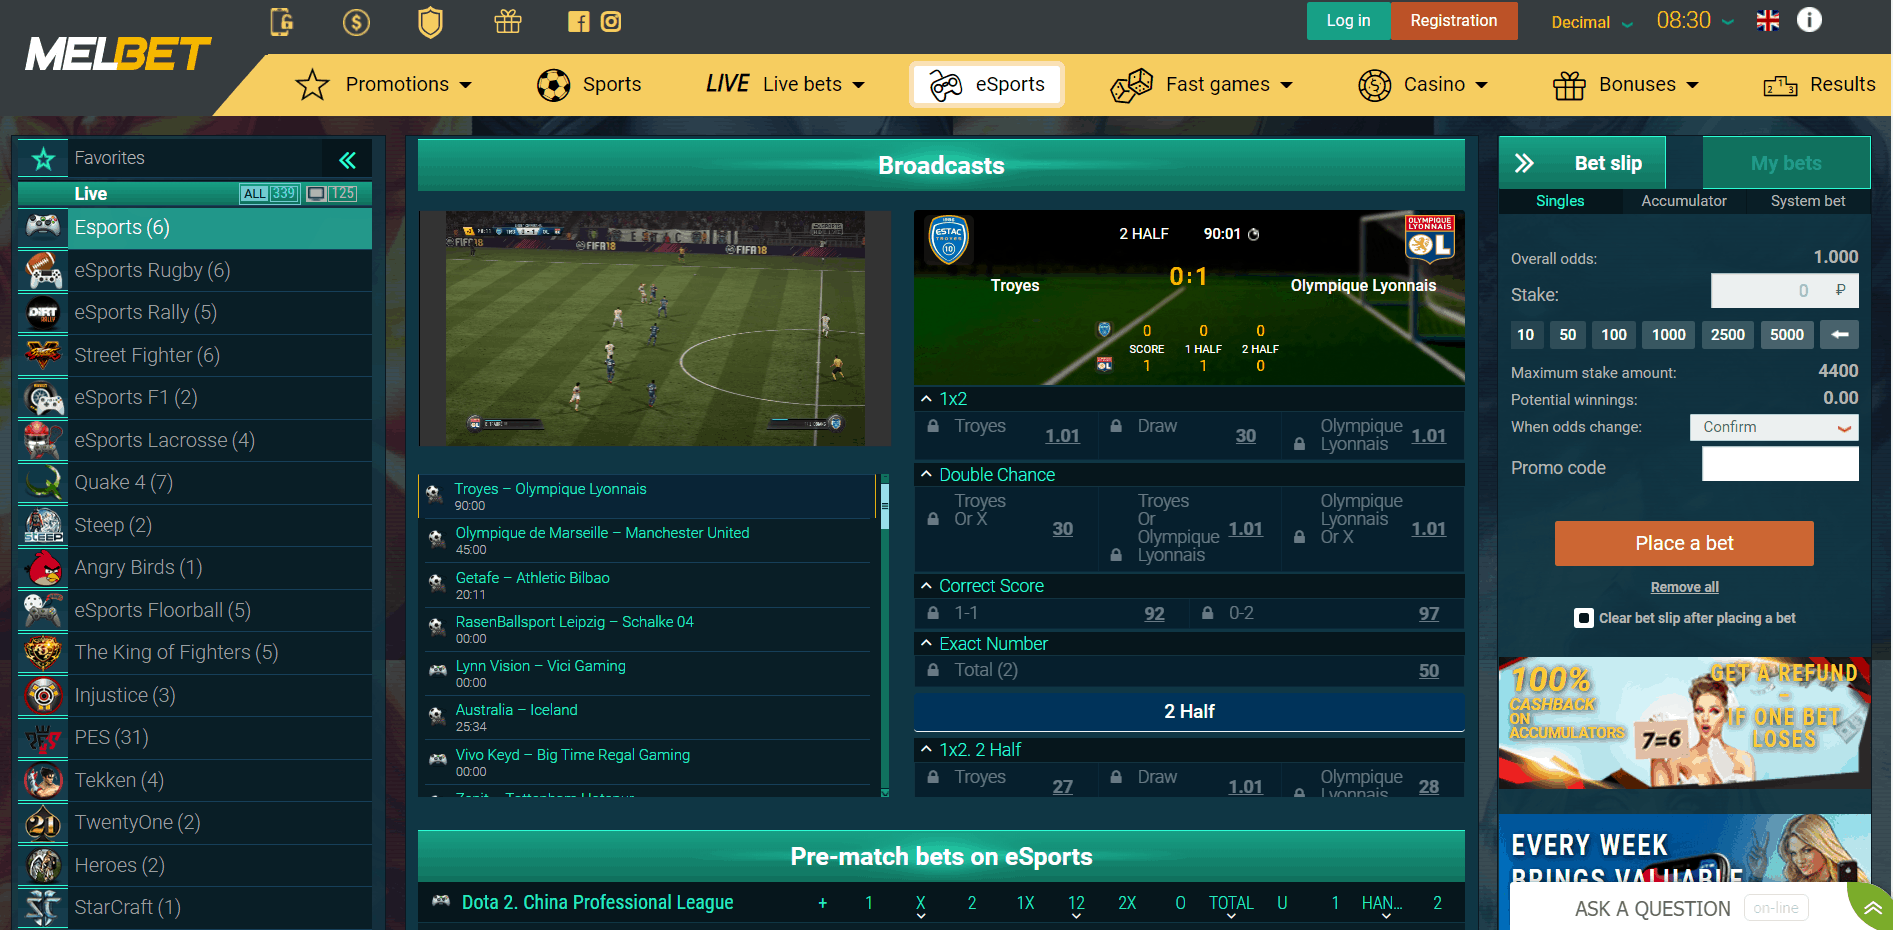 screenshot of melbet esports betting options